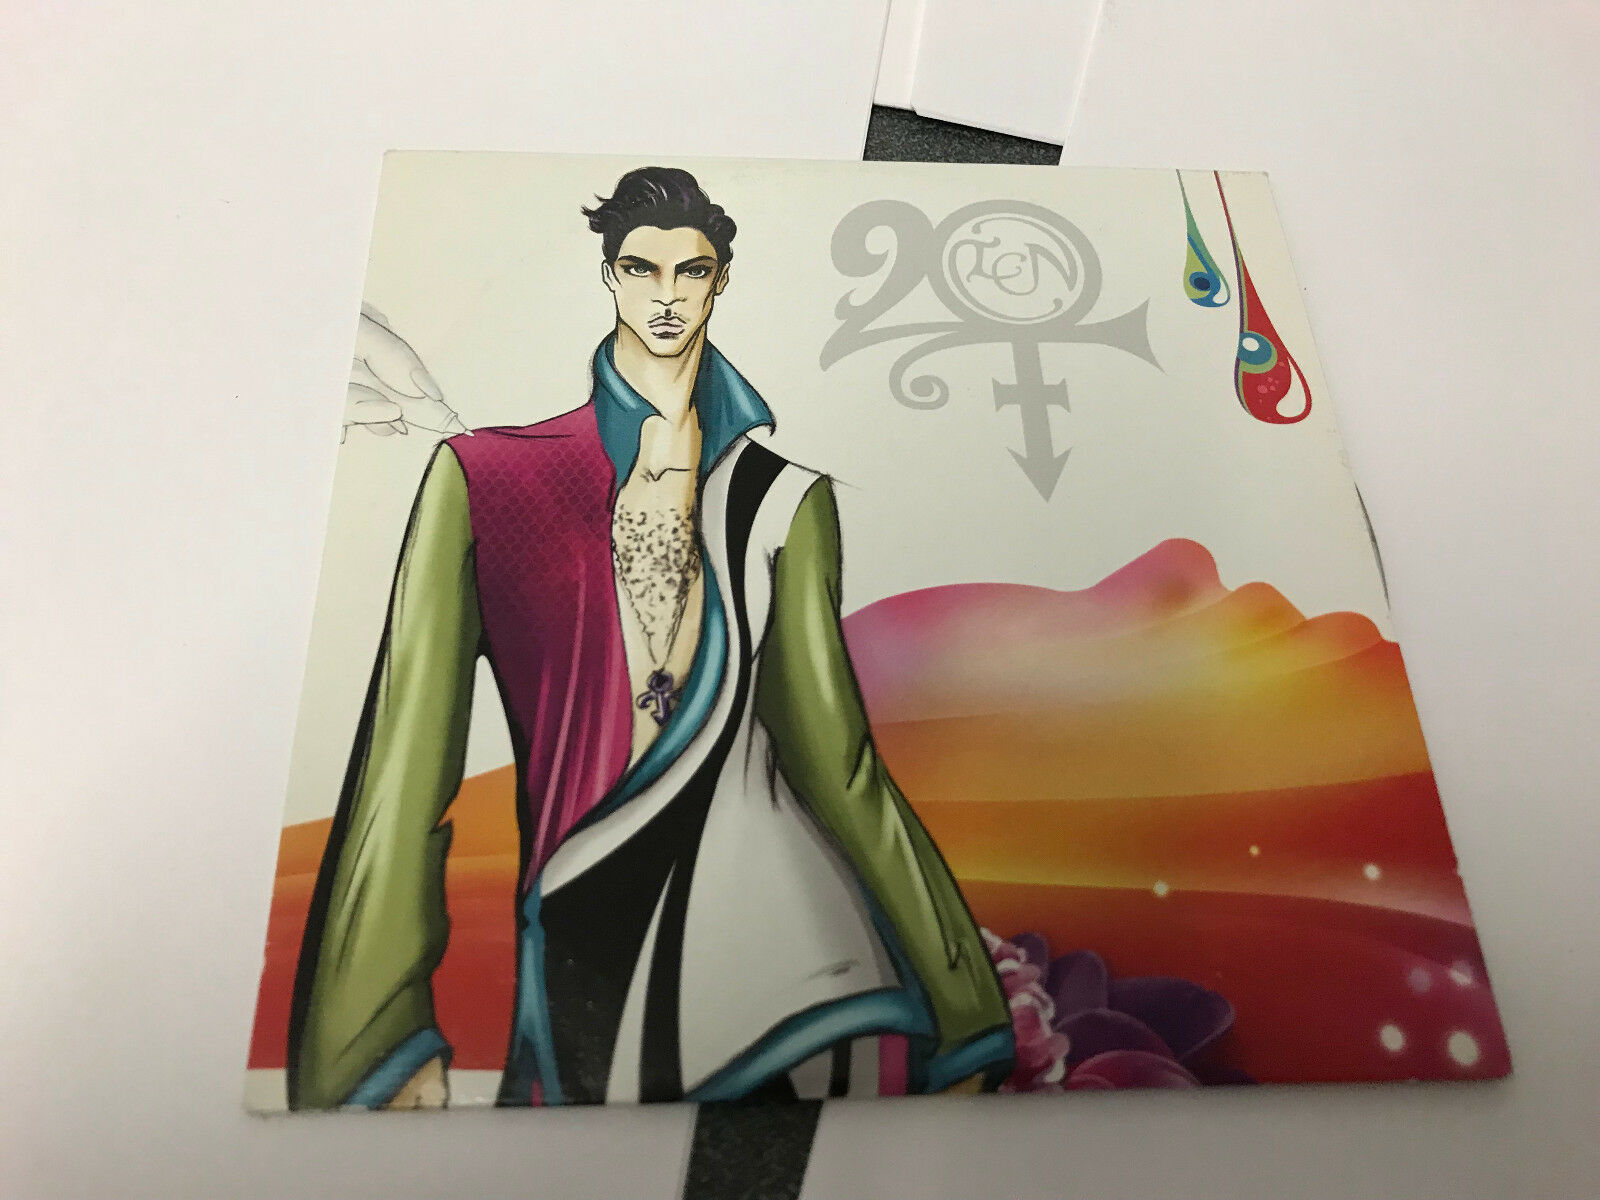 PRINCE 20TEN NPG RECORDS 2010 UK CD PROMO 20 TEN EX/EX